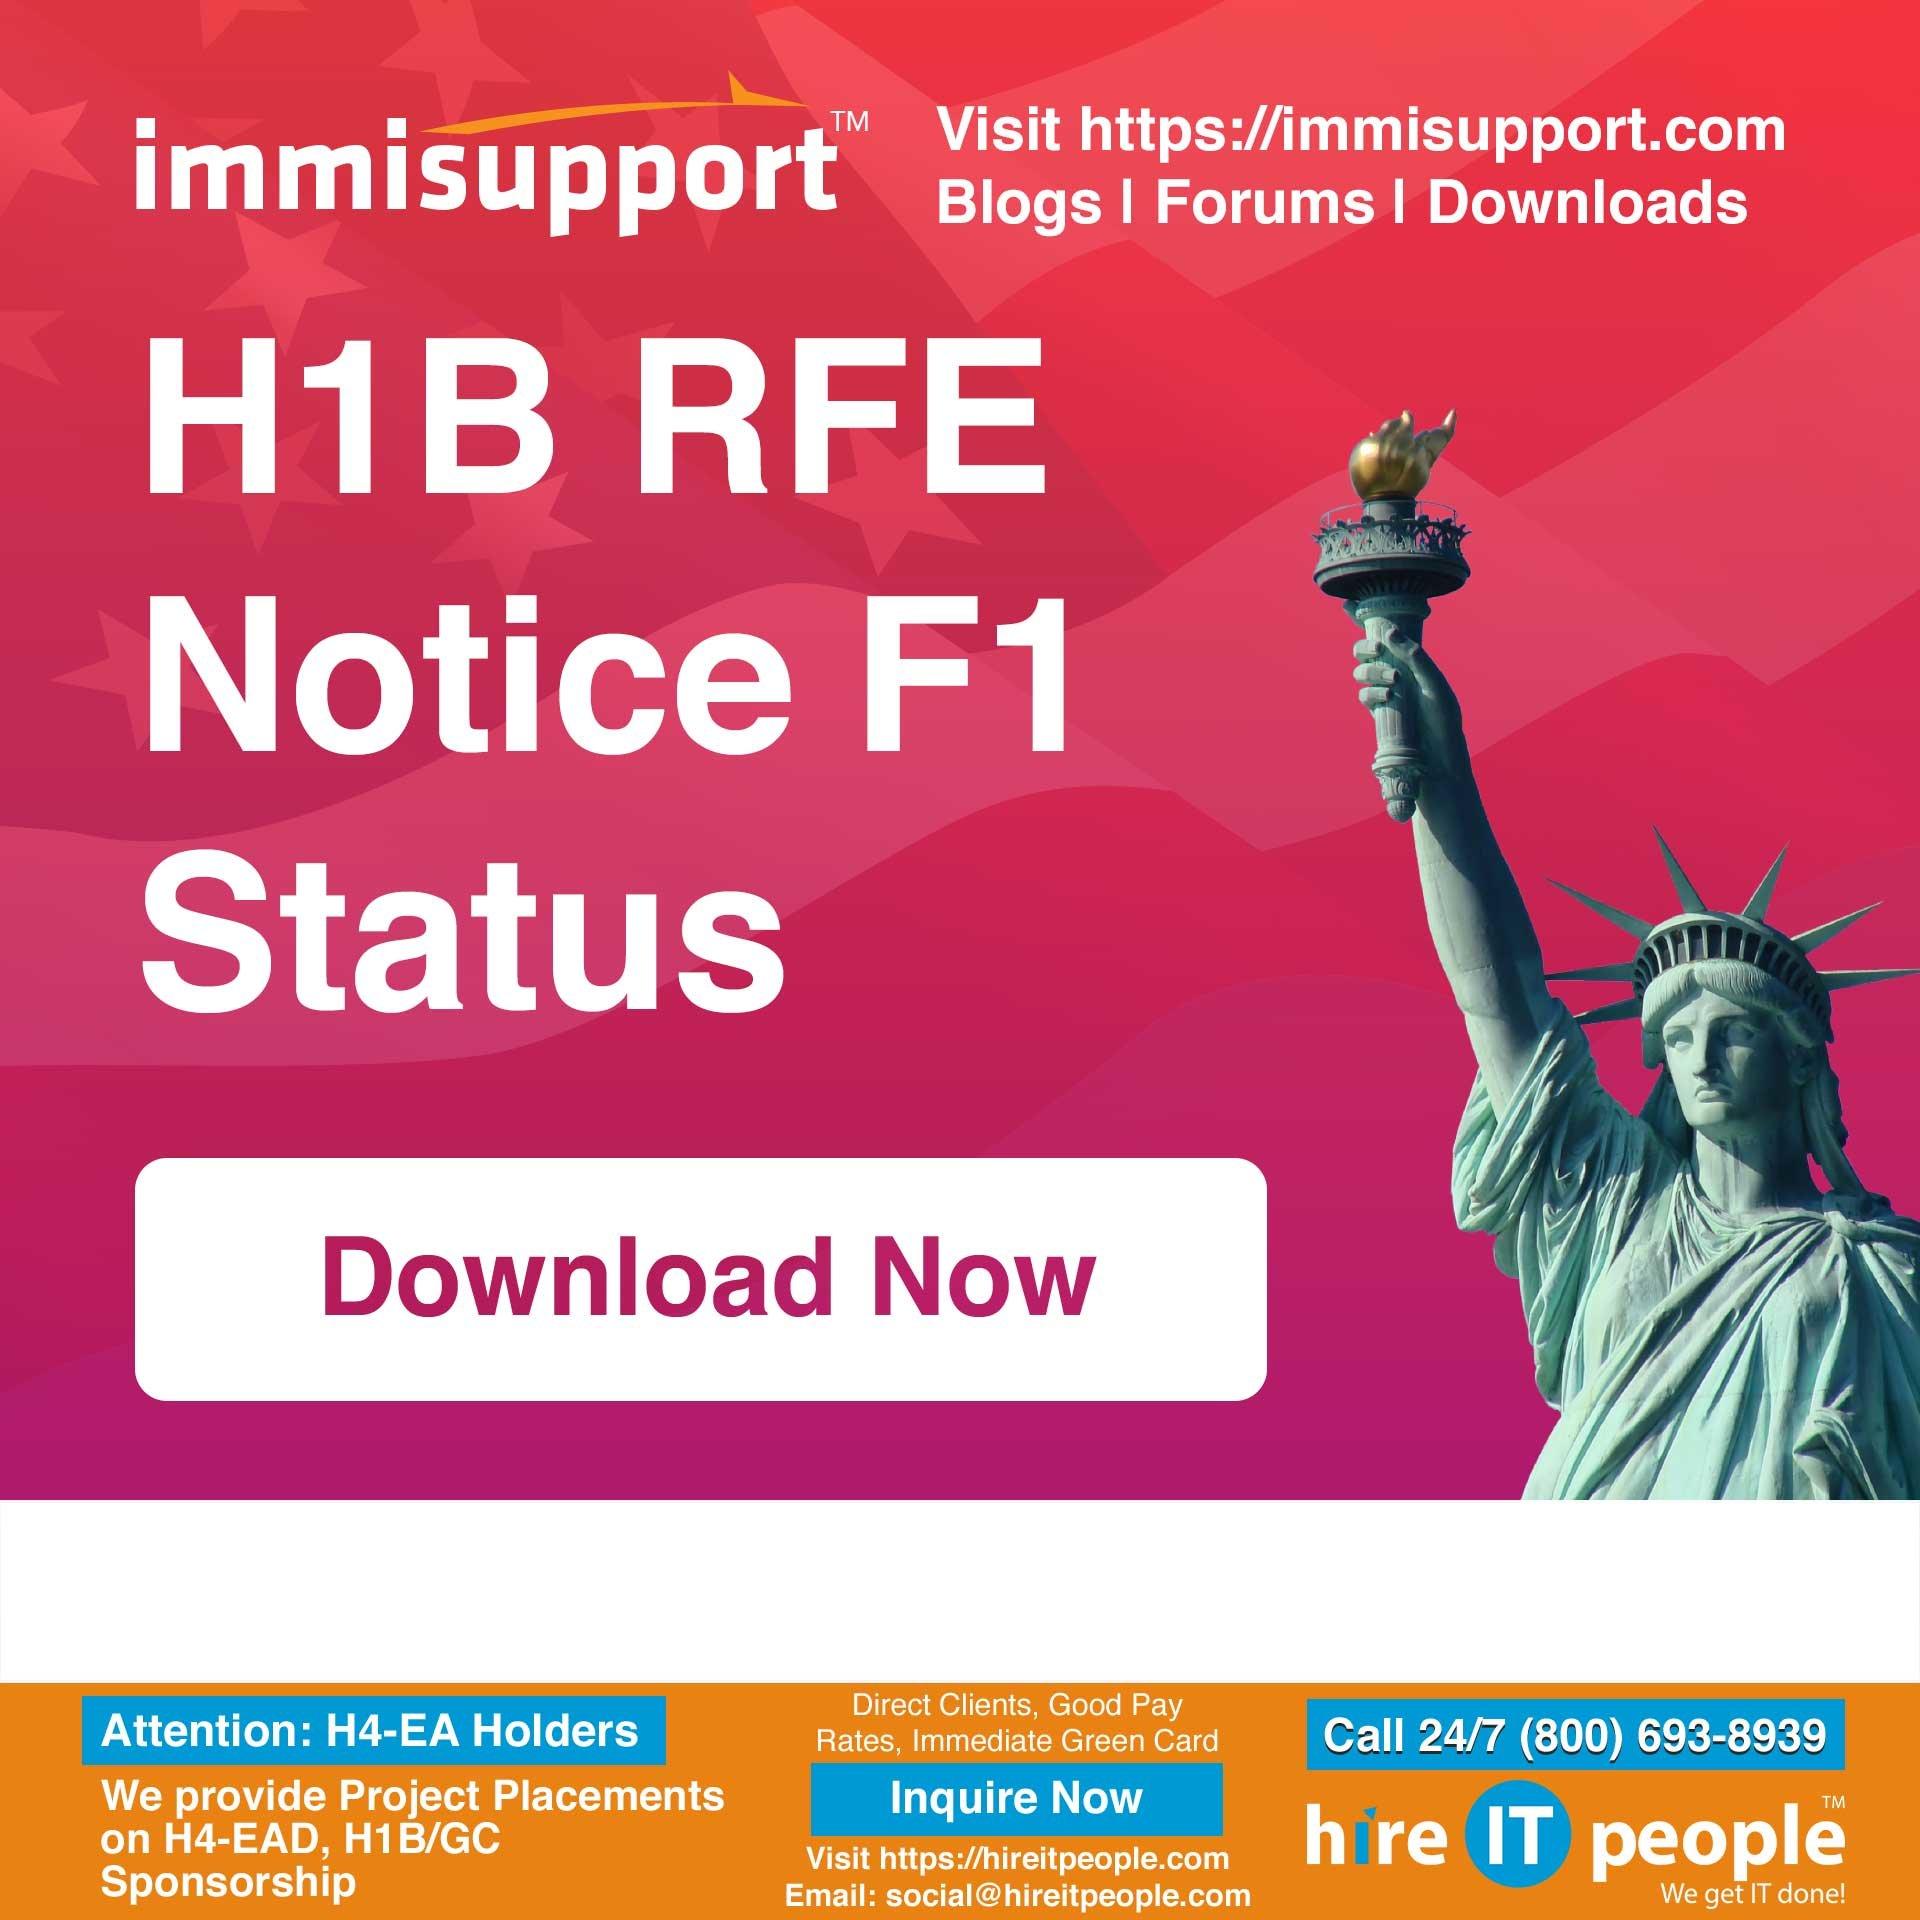 H1B RFE Notice F1 Status